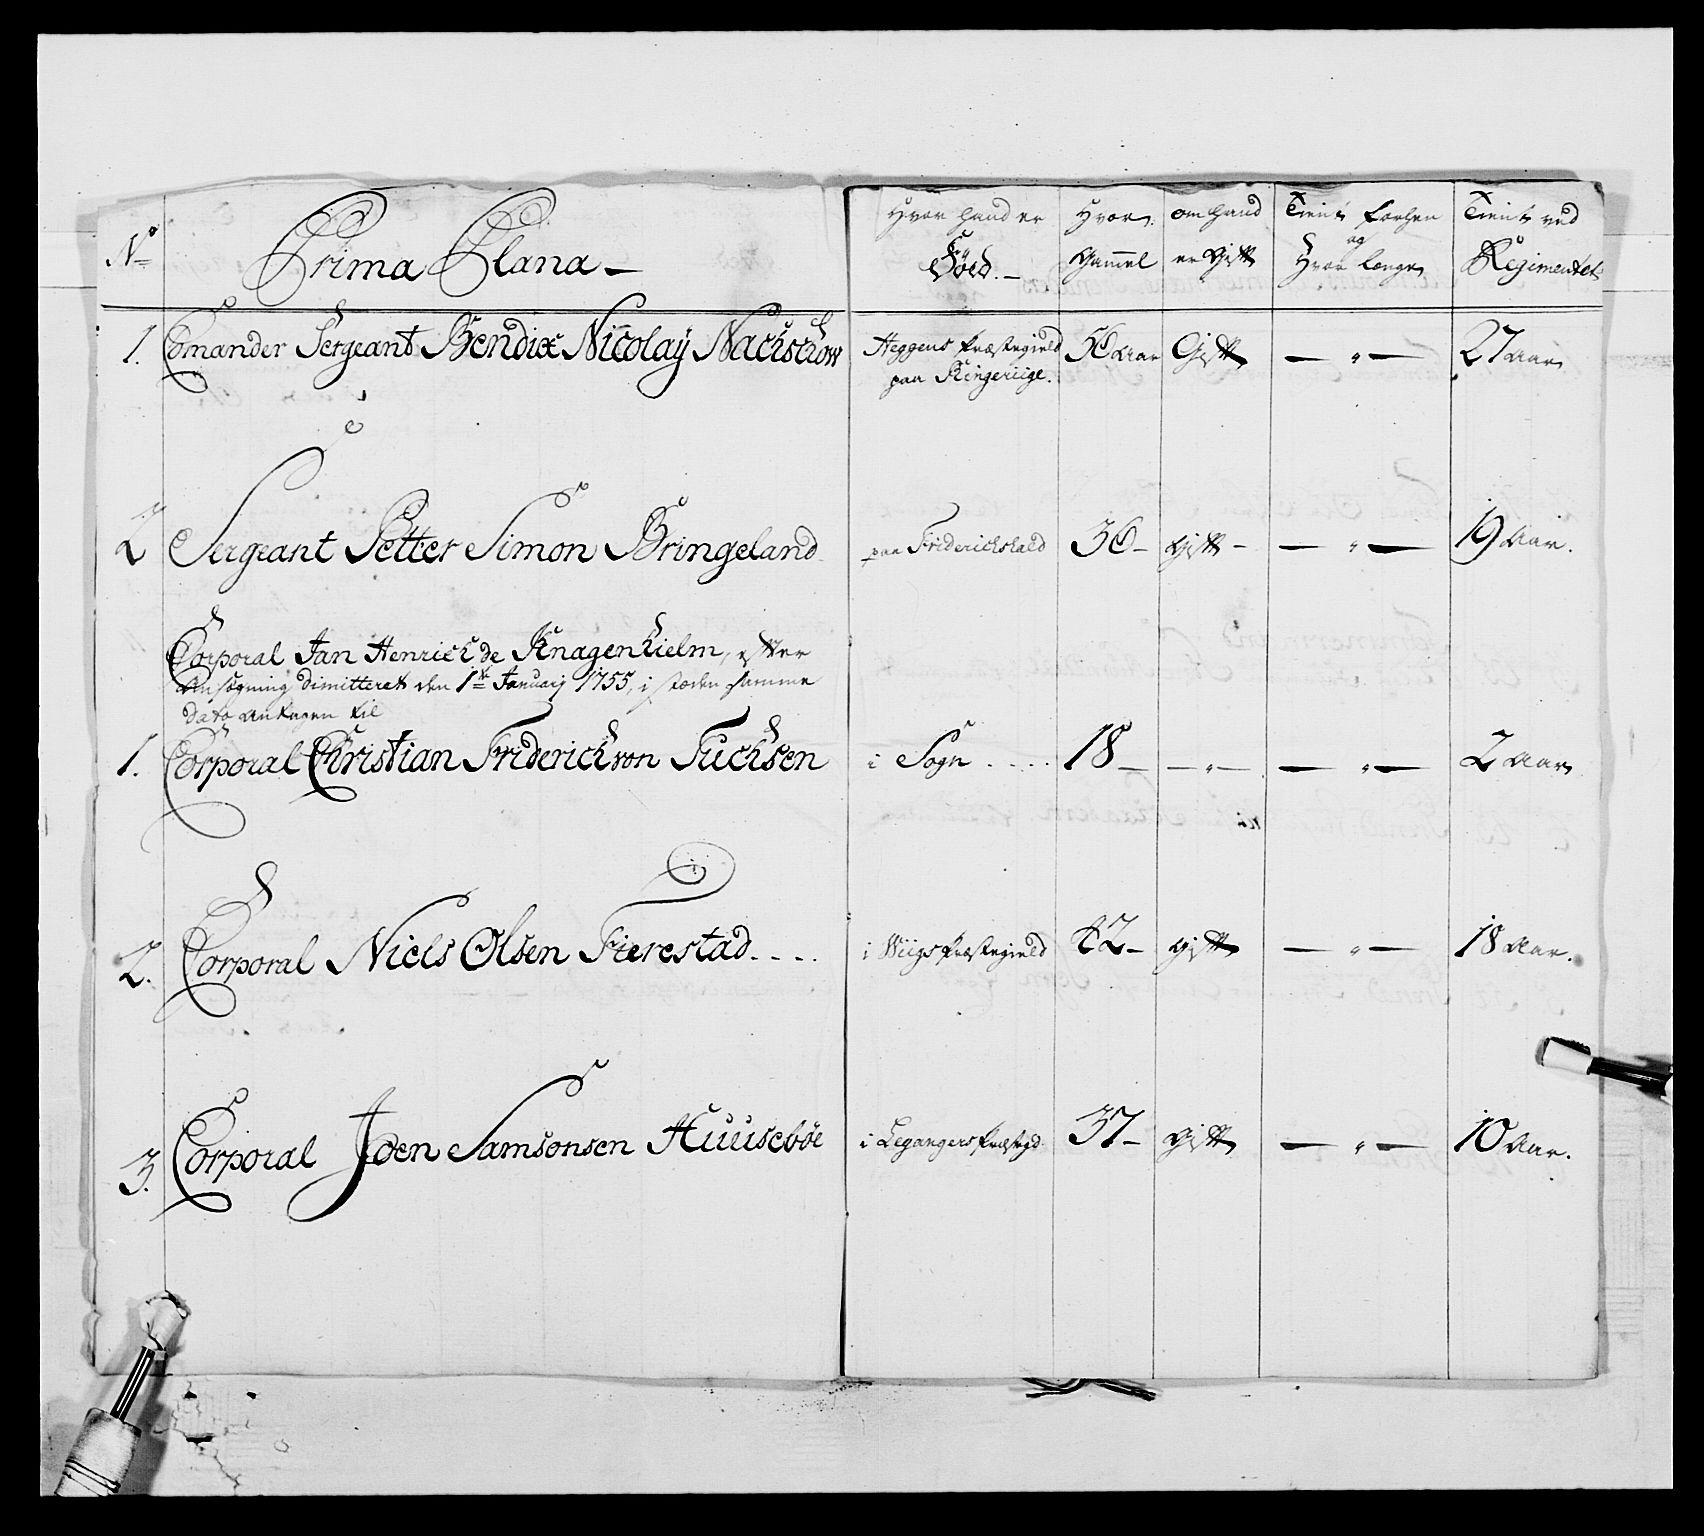 RA, Kommanderende general (KG I) med Det norske krigsdirektorium, E/Ea/L0517: 1. Bergenhusiske regiment, 1742-1756, s. 219